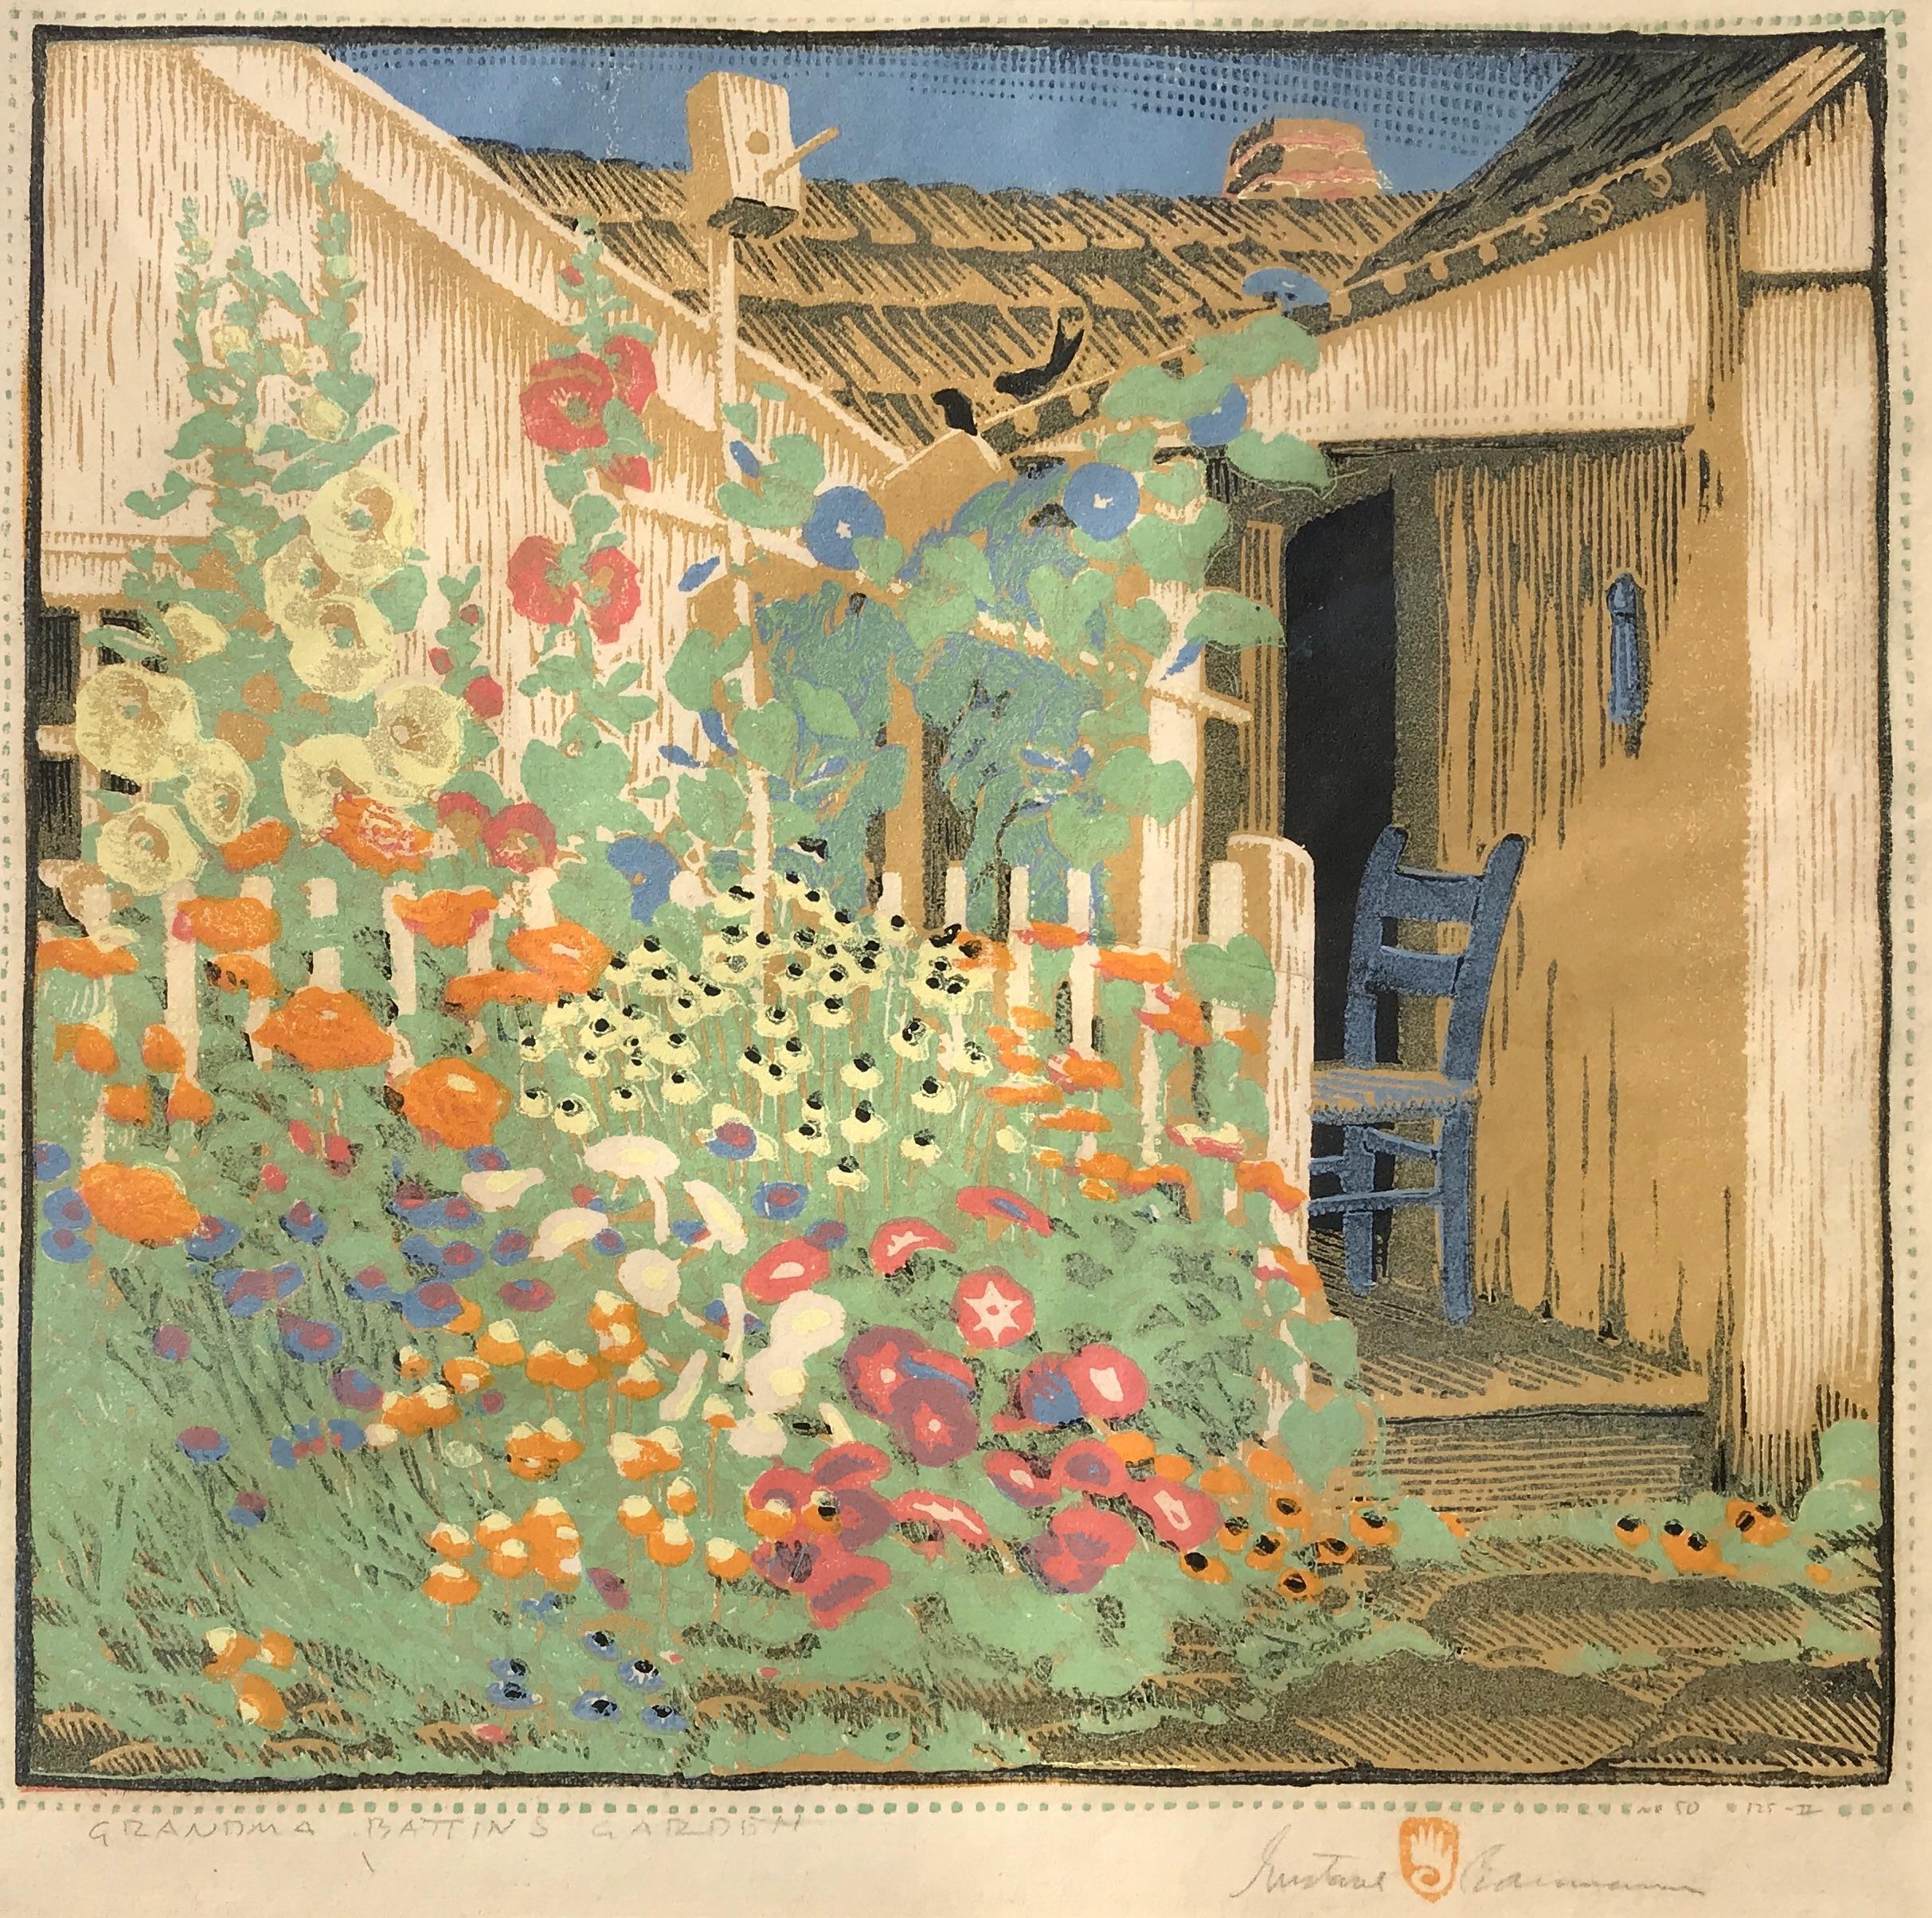 Baumann-Grandma Battin's Garden-2-cropped